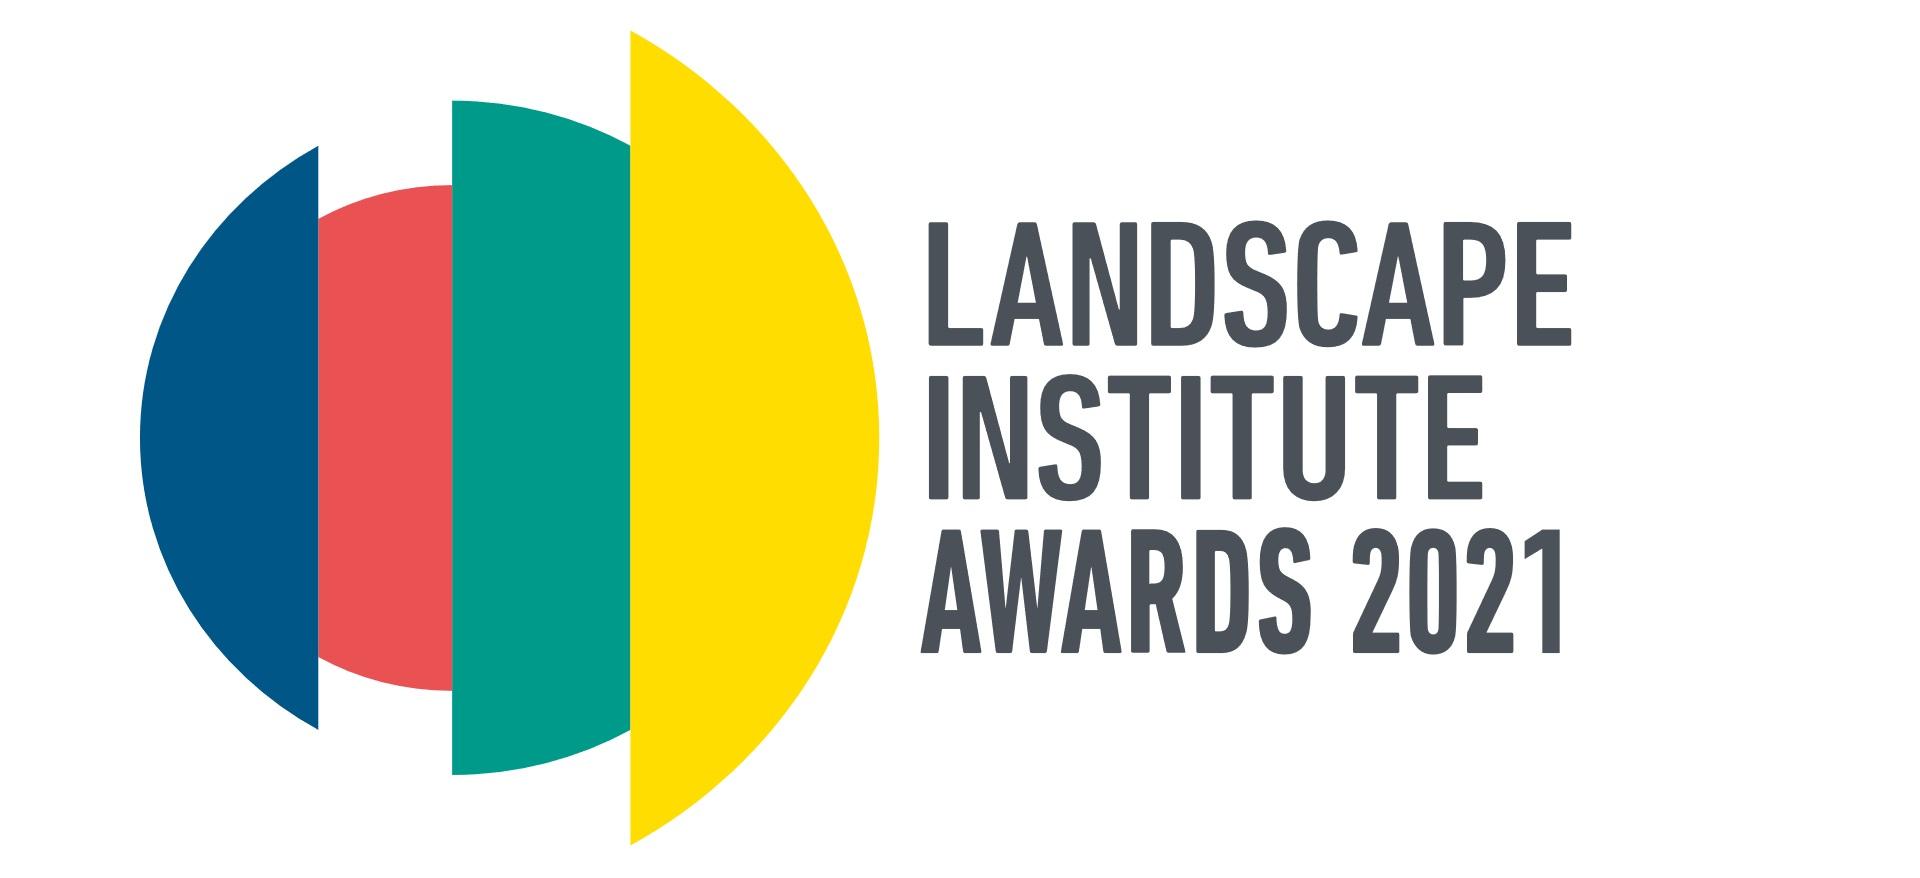 Landscape Institute Awards 2021